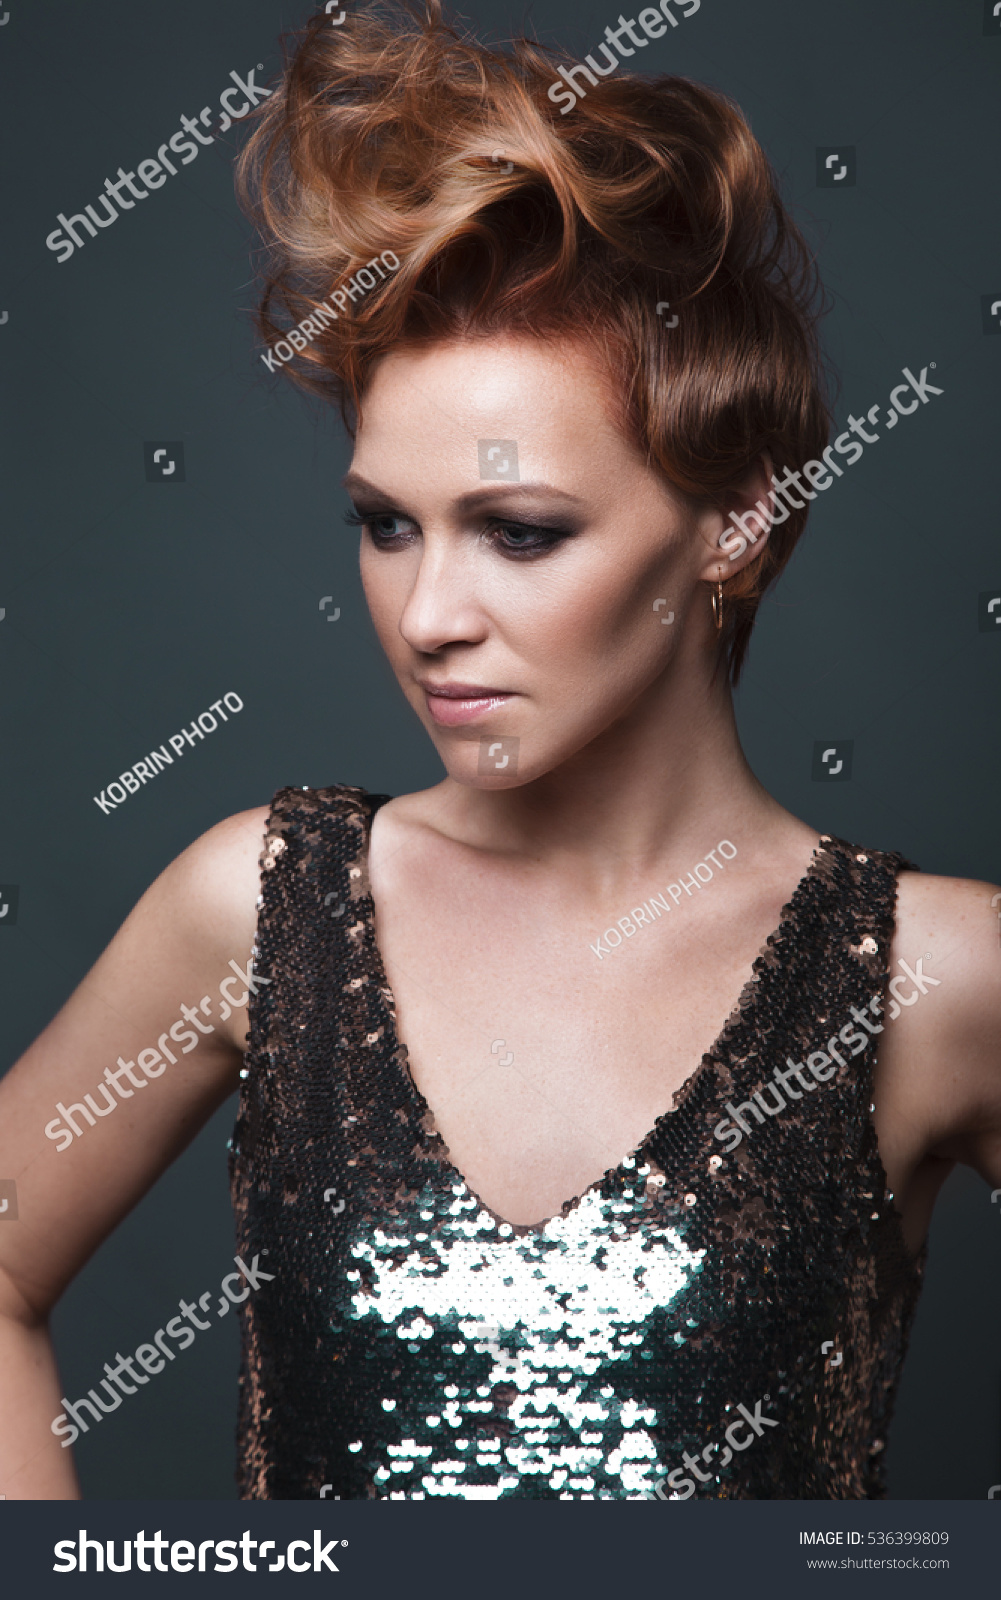 Beautiful Girl Evening Dress Avantgarde Hairstyles Stock Photo (Edit ...